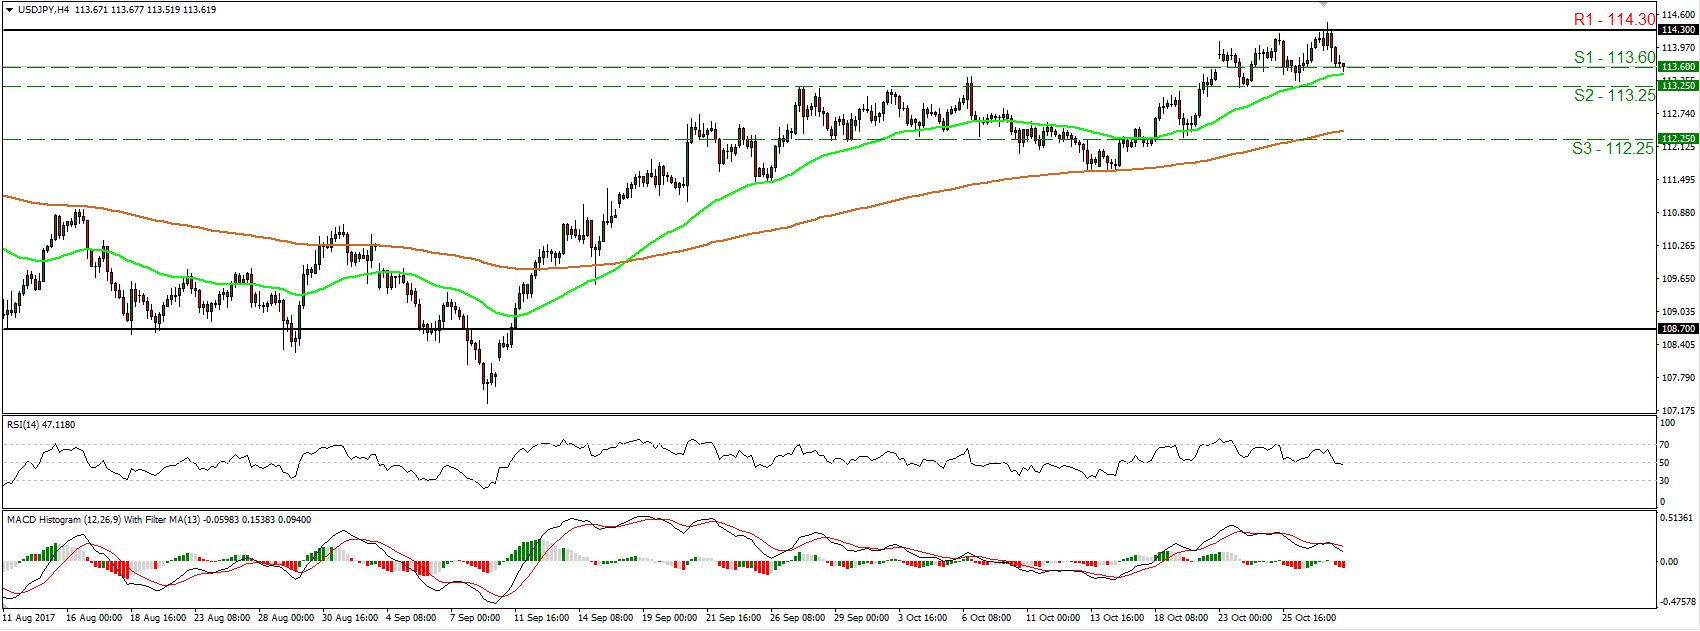 USD/JPY 30 Oct 2017 | Econ Alerts